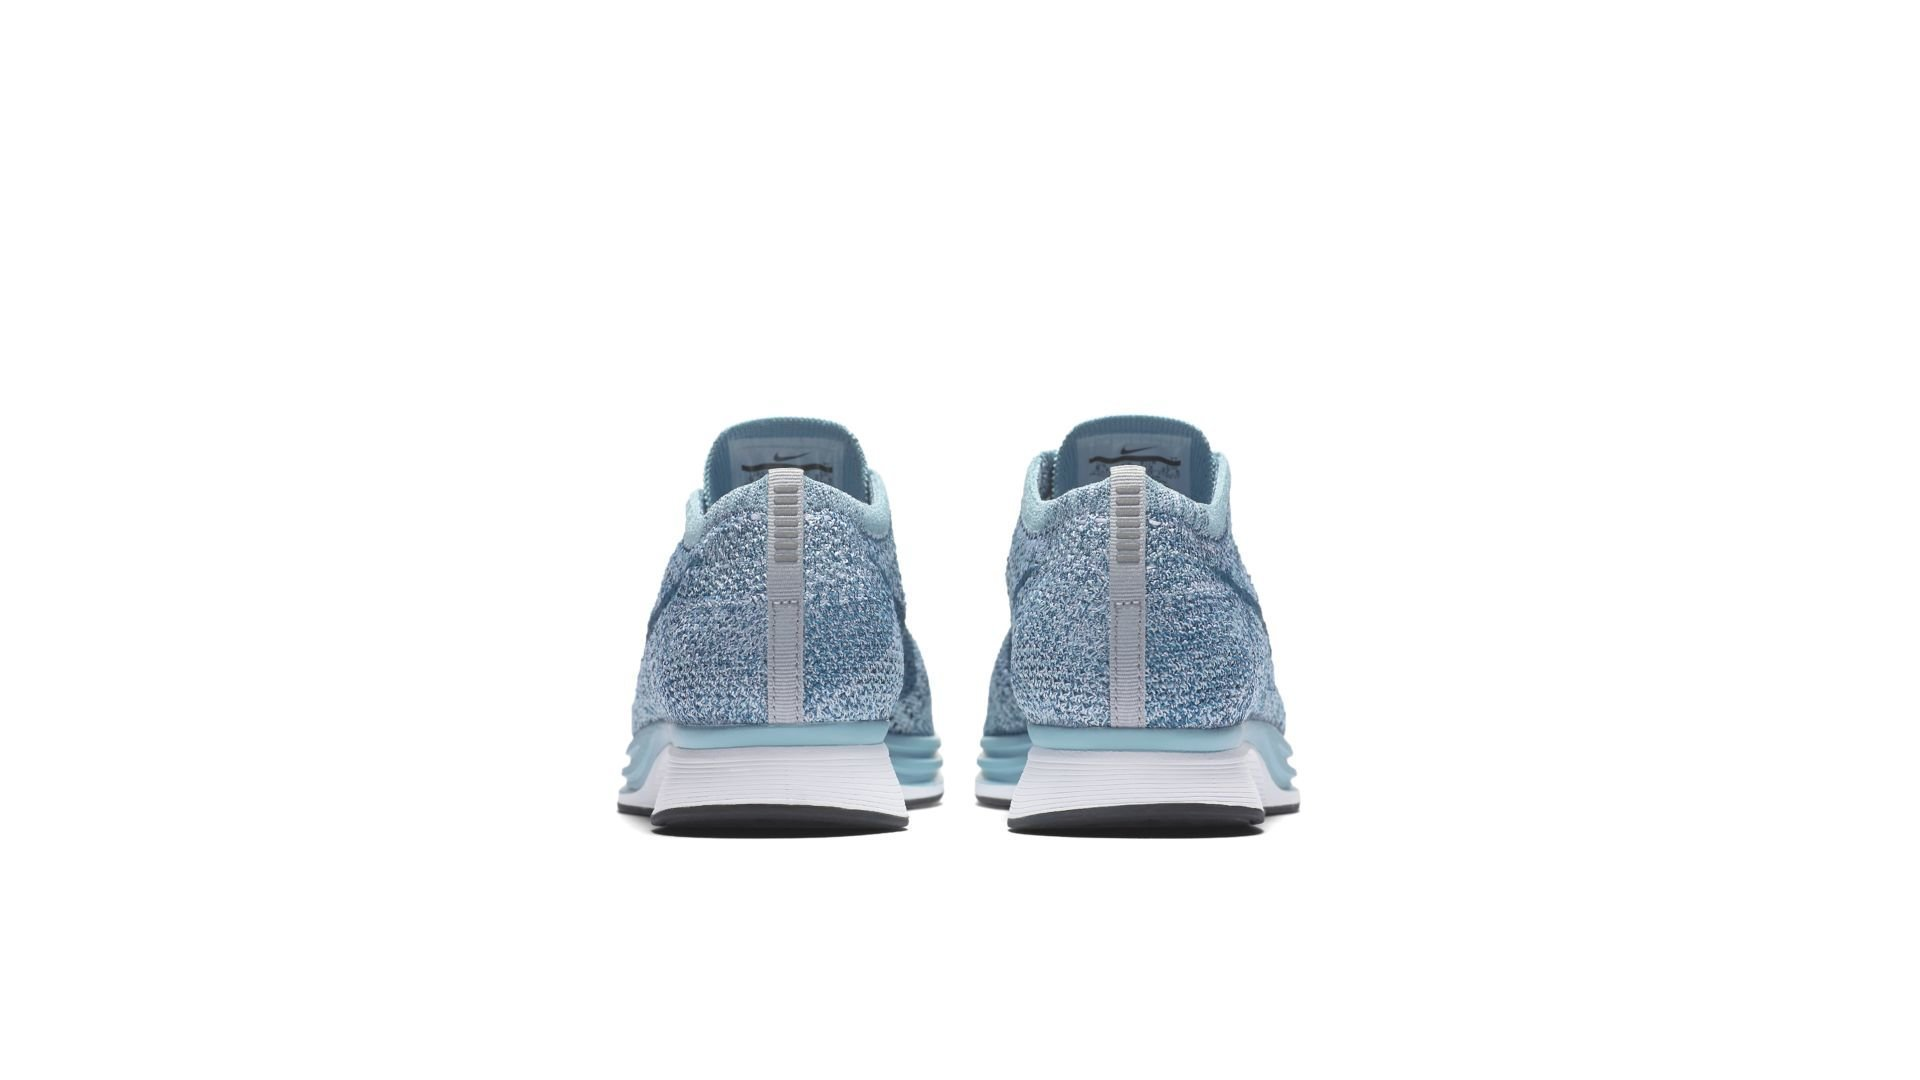 Nike Flyknit Racer Macaron Pack Blueberry (526628-102)